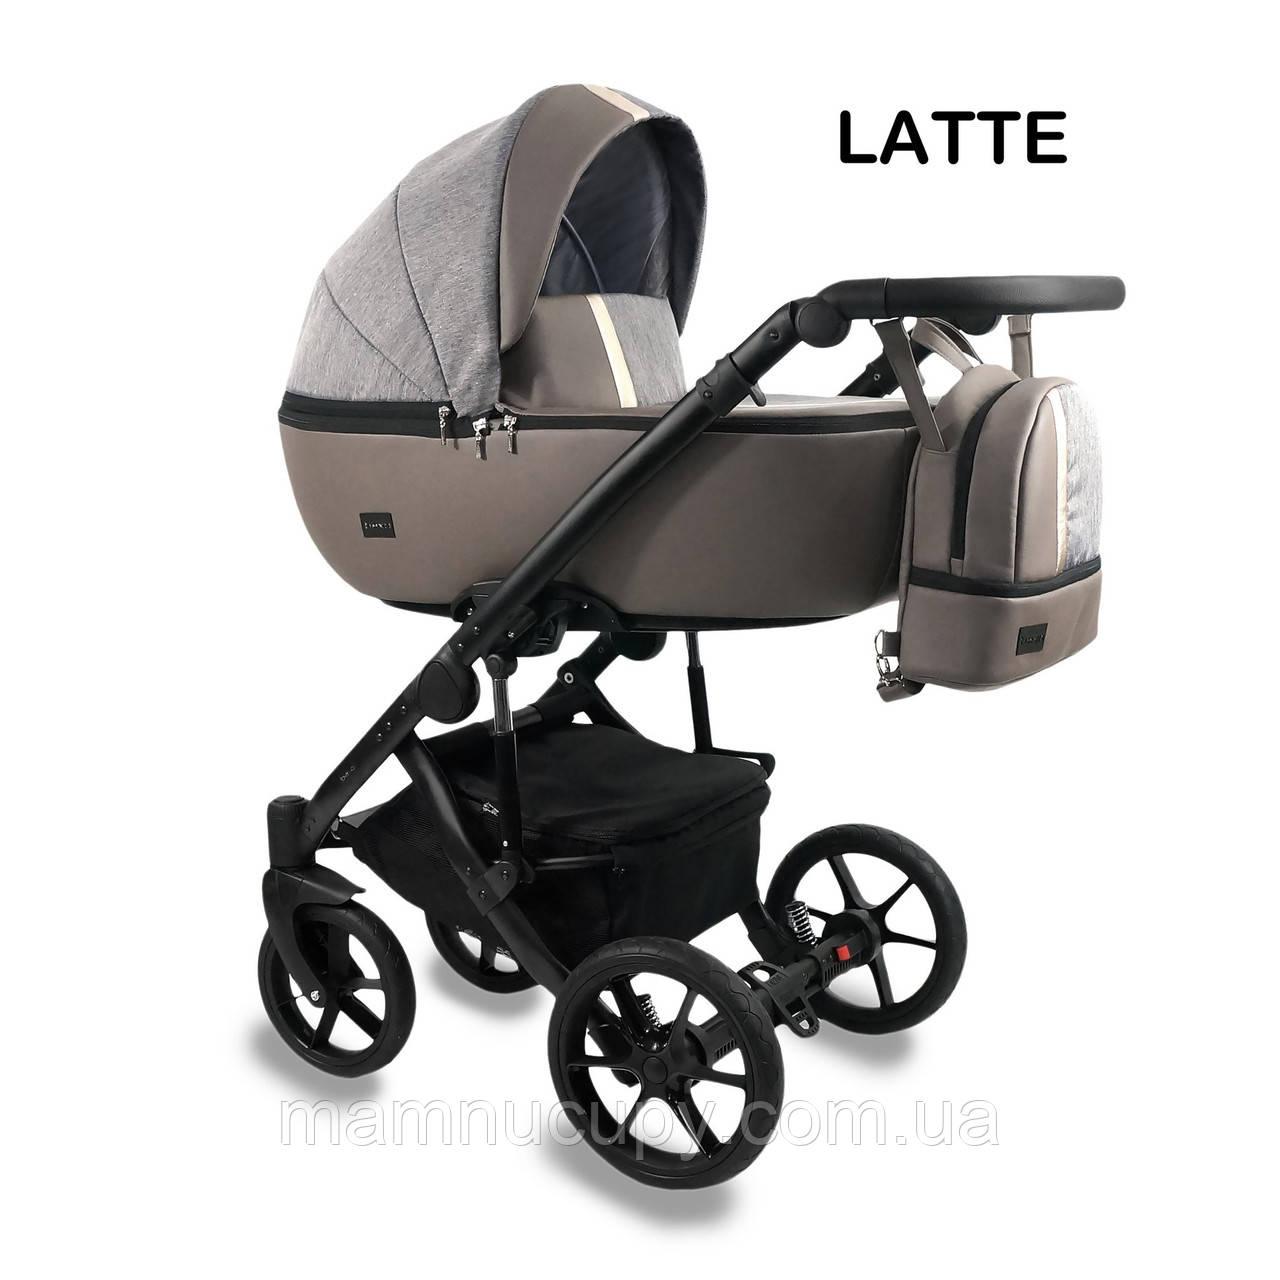 Дитяча універсальна коляска 2 в 1 Bexa Air Latte